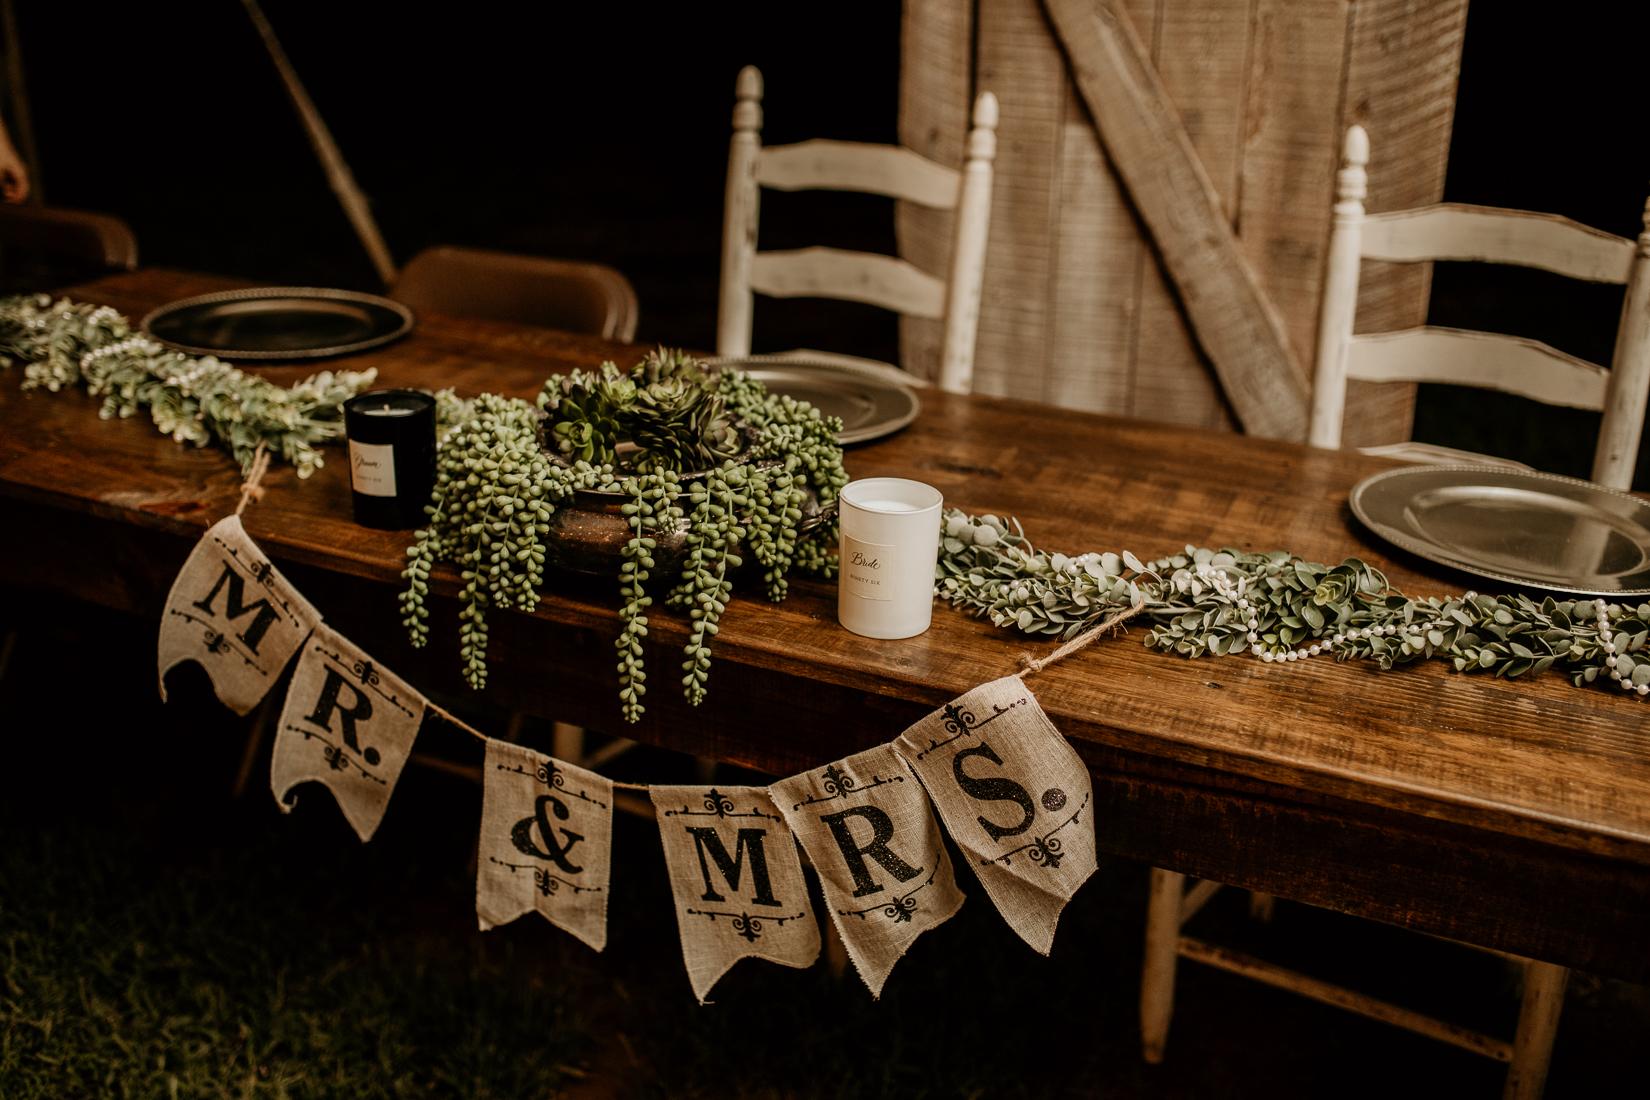 olivia_zay_wedding_09_2018-9041.jpg